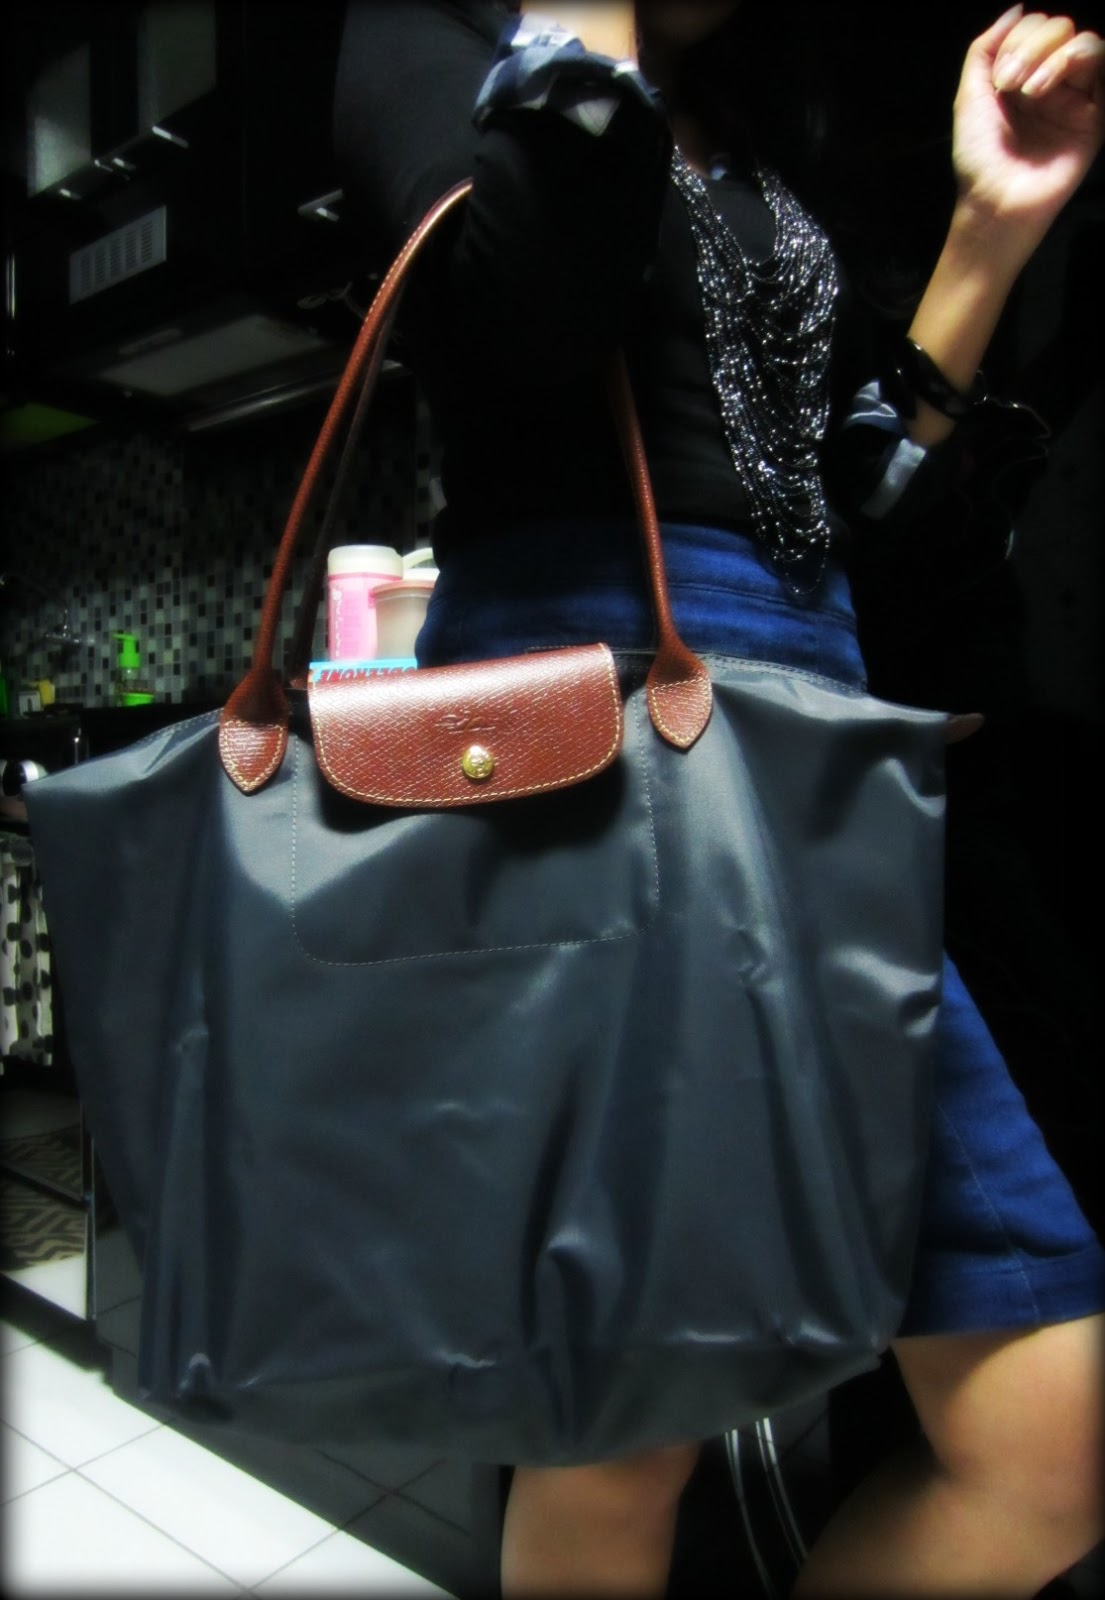 Forum on this topic: Happy Birthday To Longchamp's Le Pliage Bag, happy-birthday-to-longchamps-le-pliage-bag/